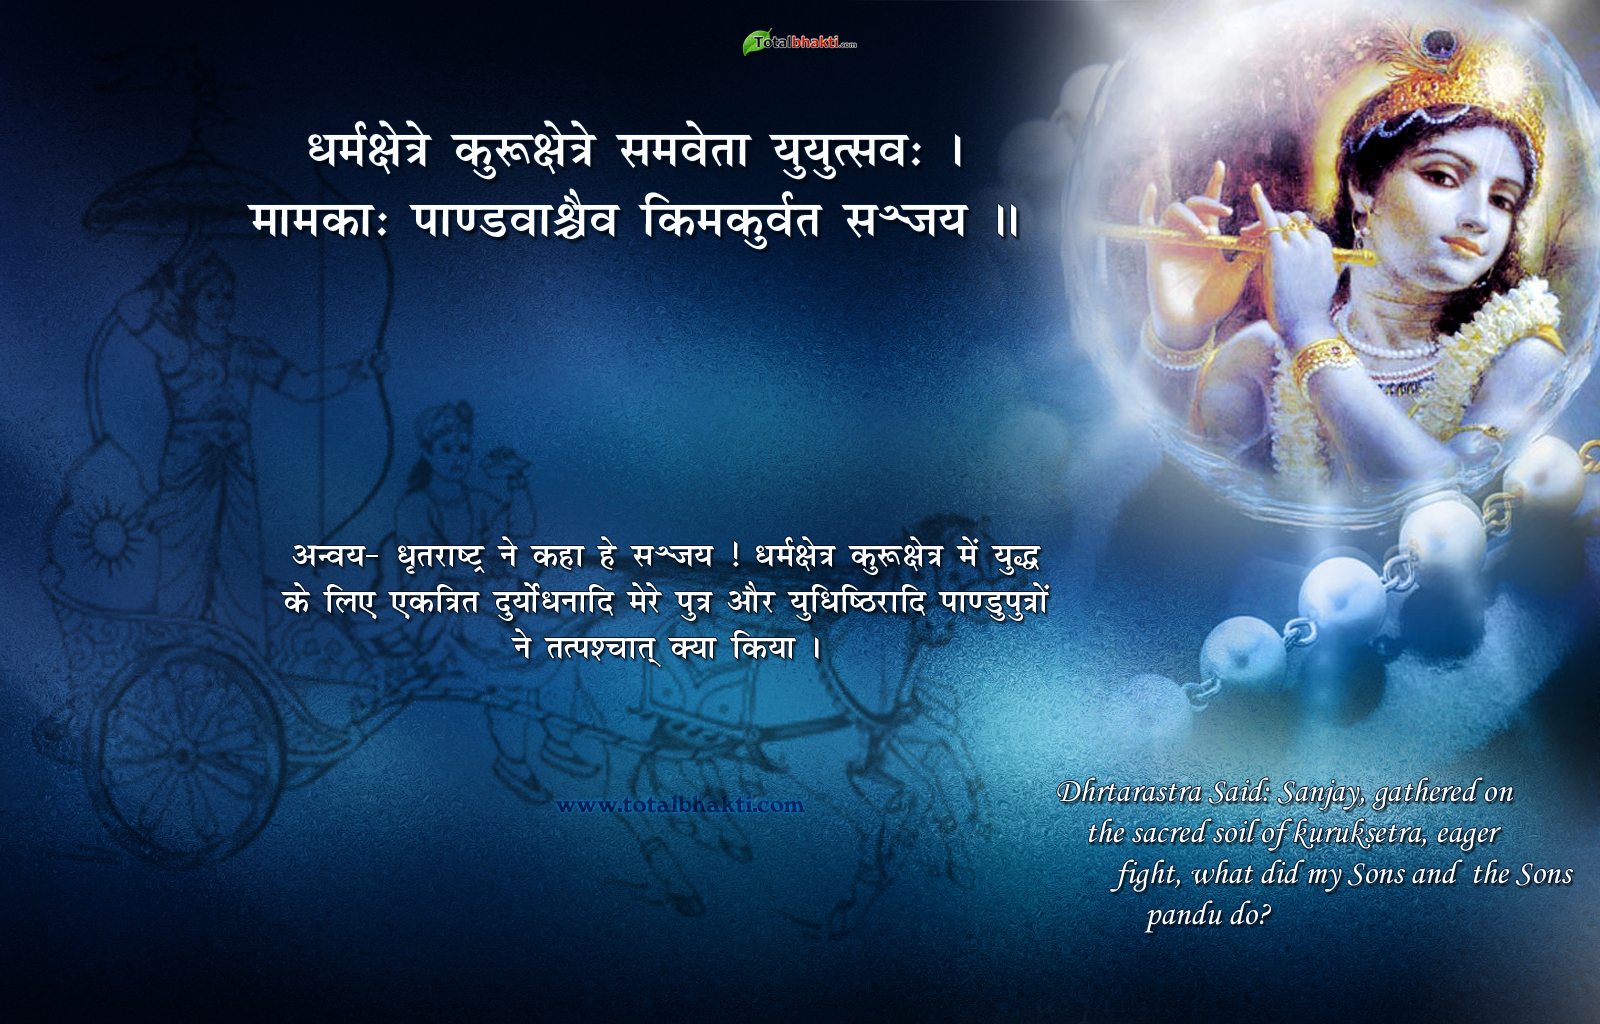 Bhagavad Gita WallpapersBhagavad Gita ImagesBhagavad Gita Pictures 1600x1024